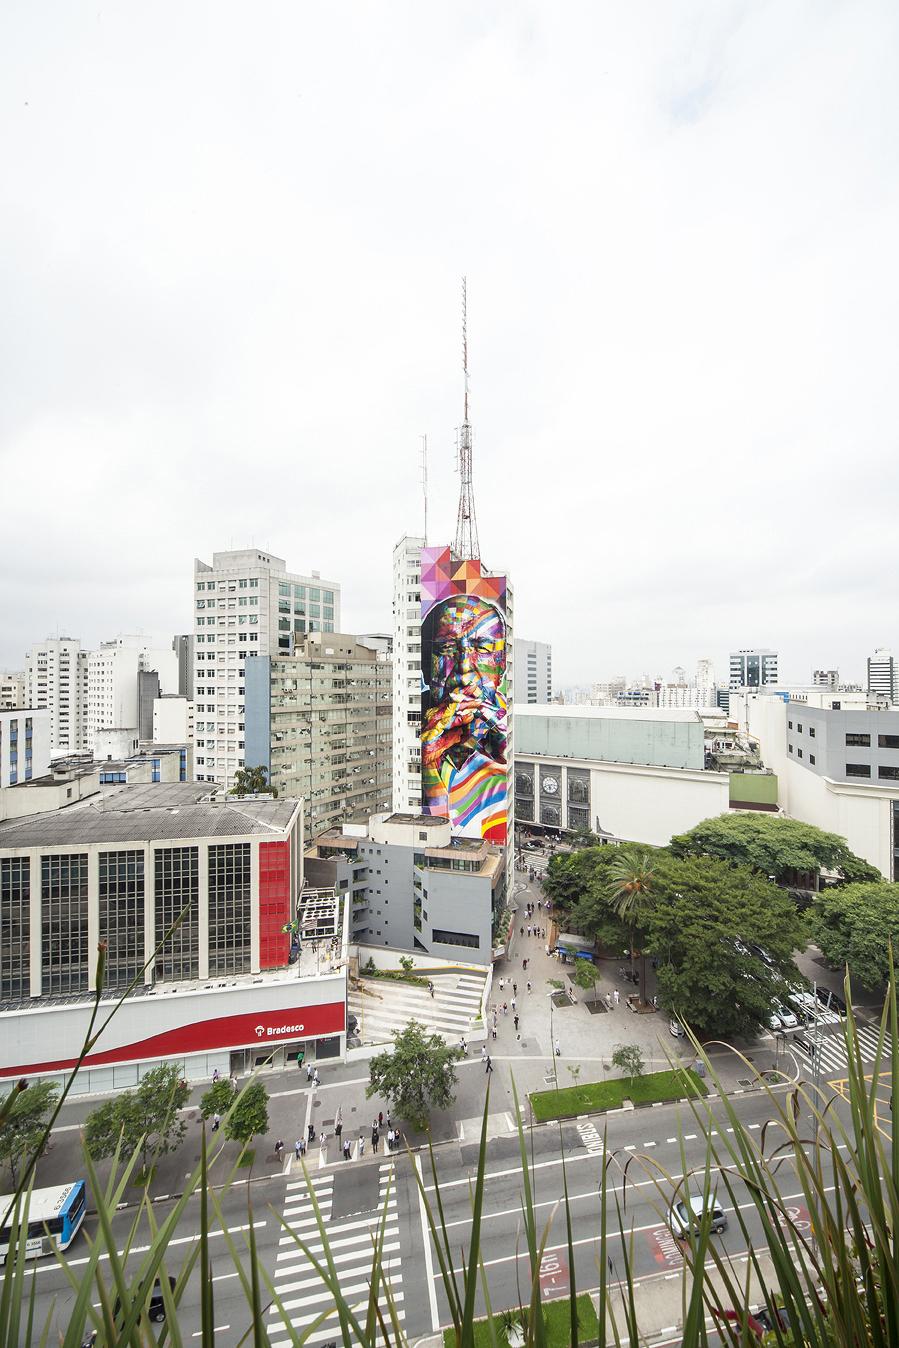 By Kobra in São Paulo, Brazil 2